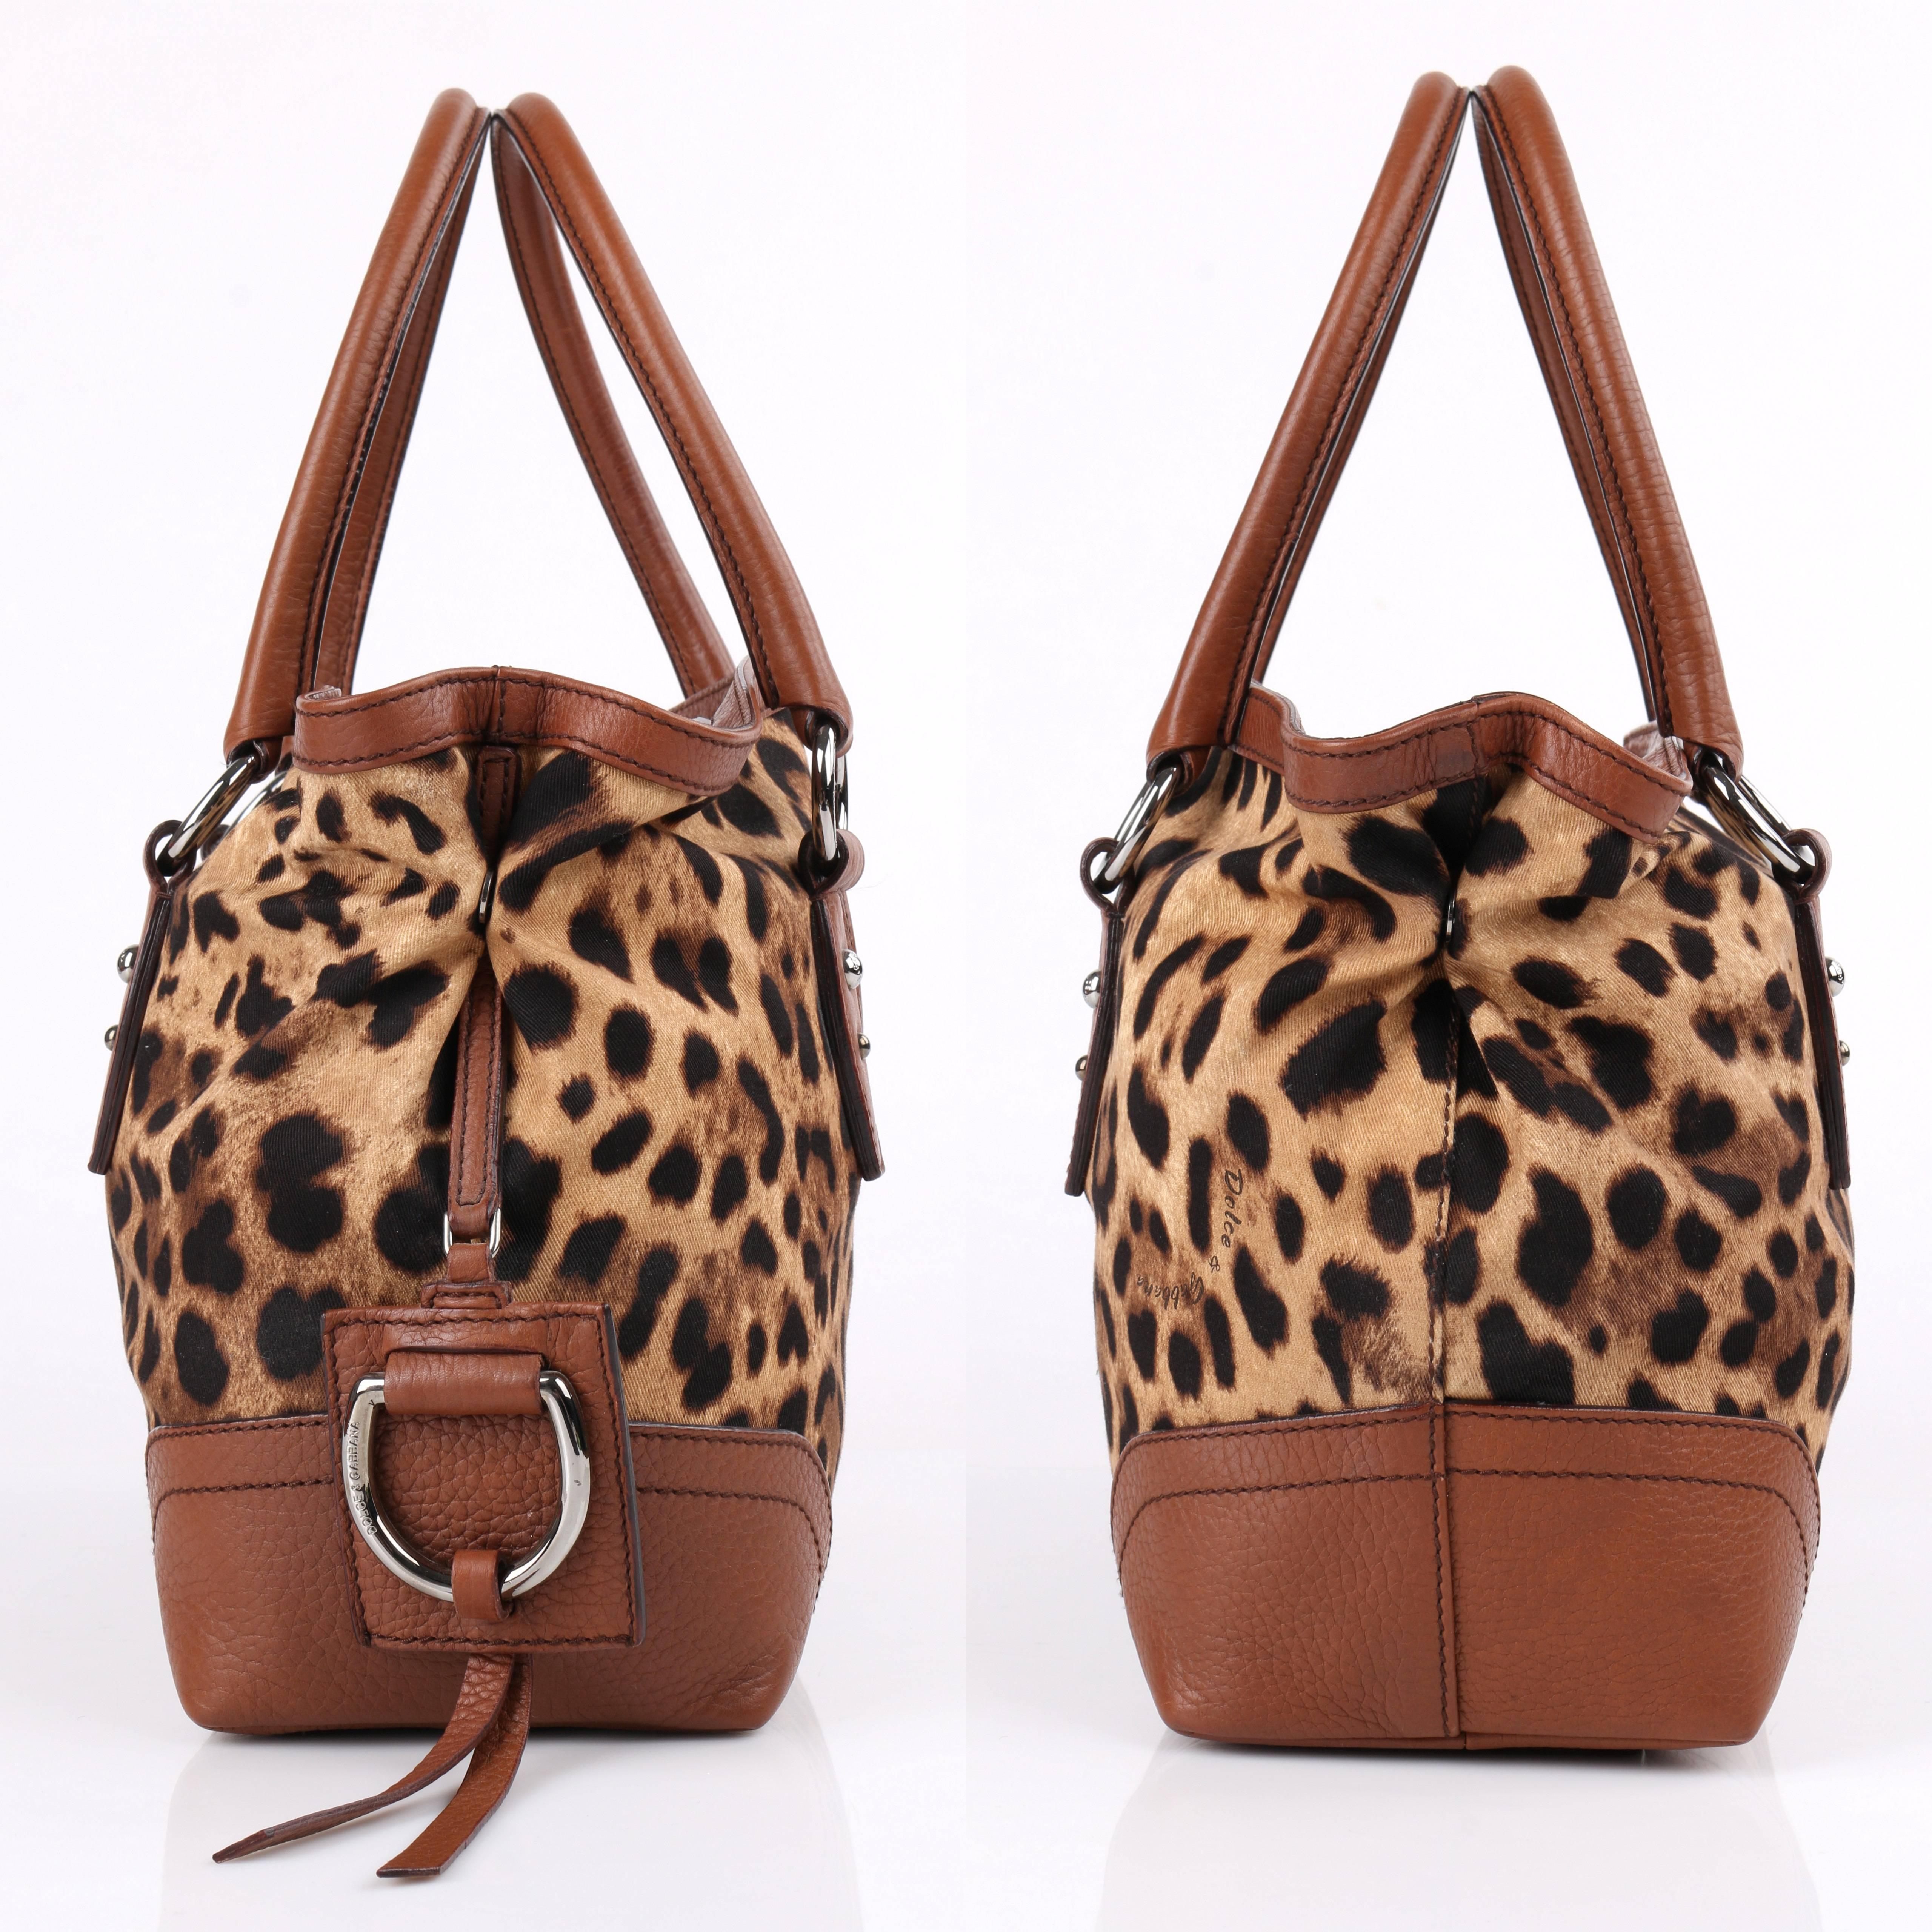 Dolce & Gabbana Animalier Leopard Animal Print Canvas & Brown Leather Satchel aJPvnN